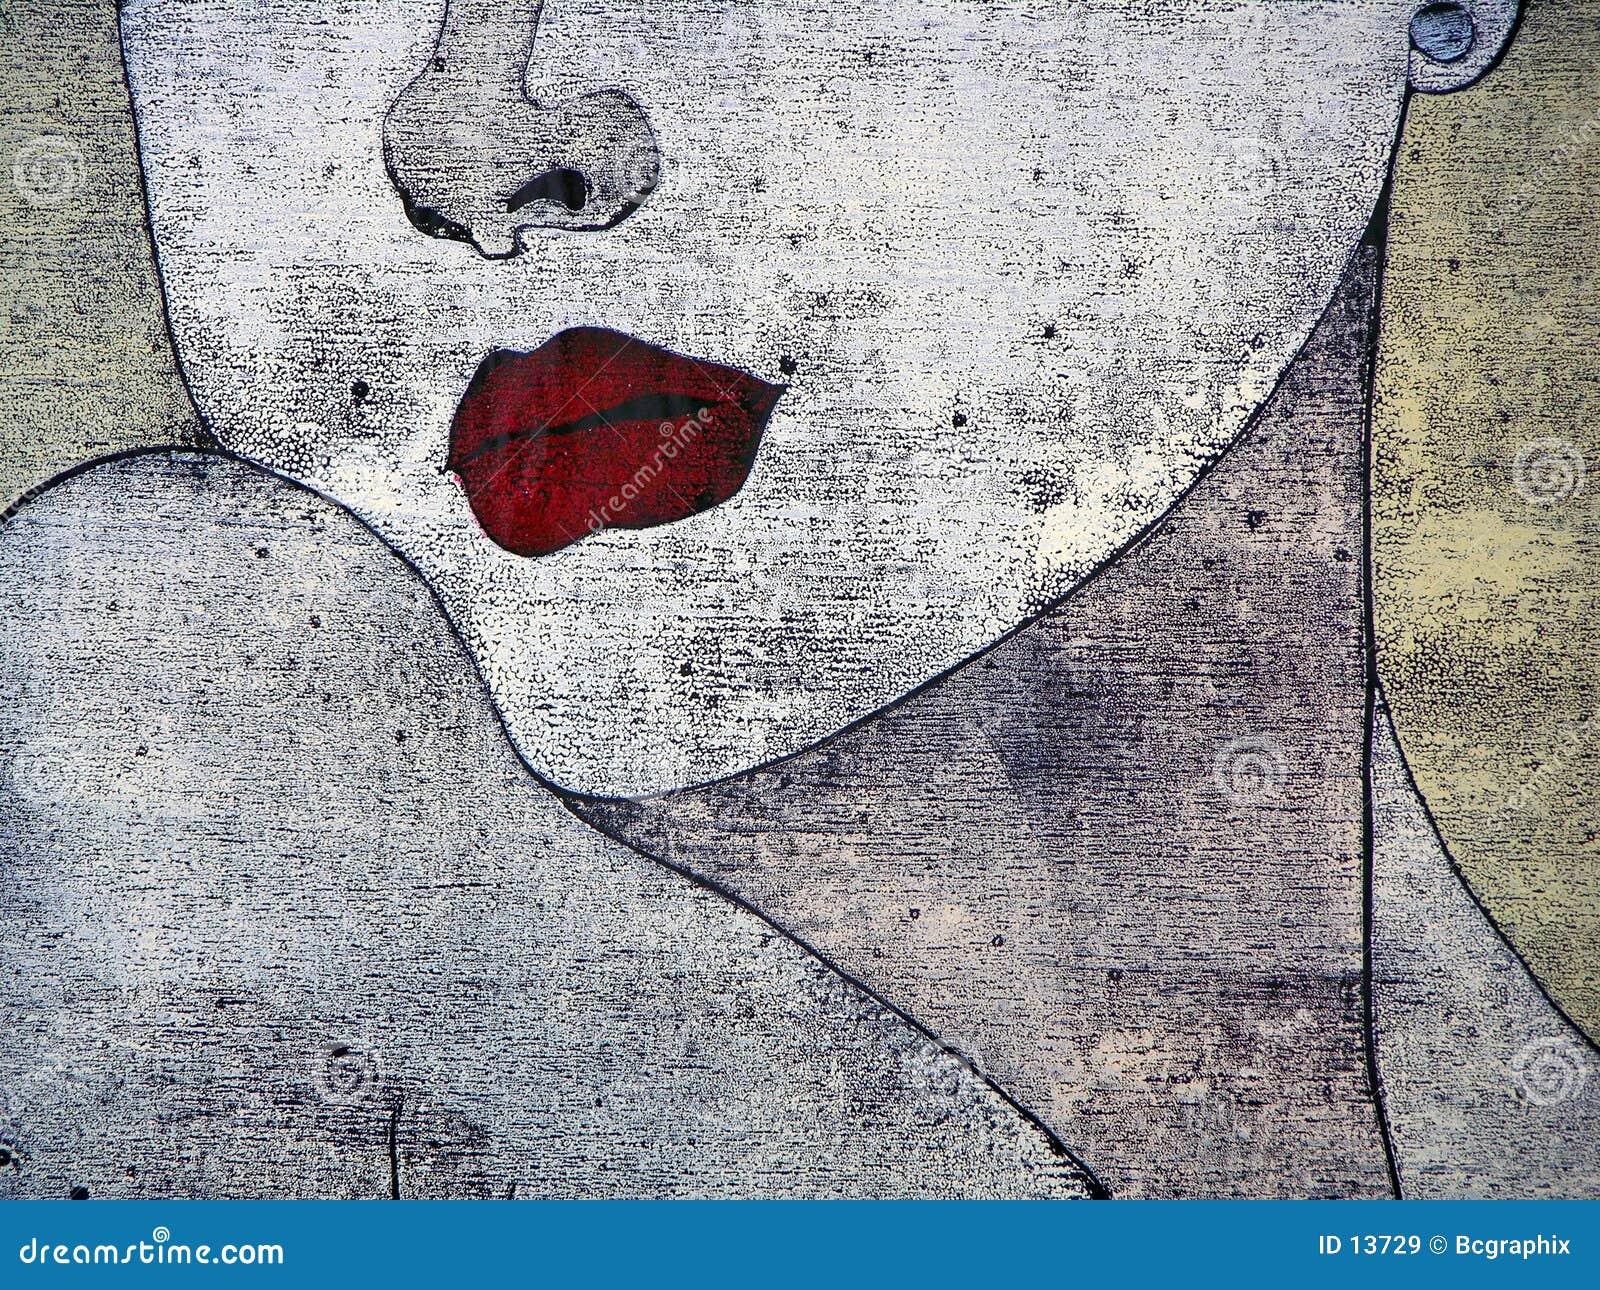 Woodprint - portait of a woman